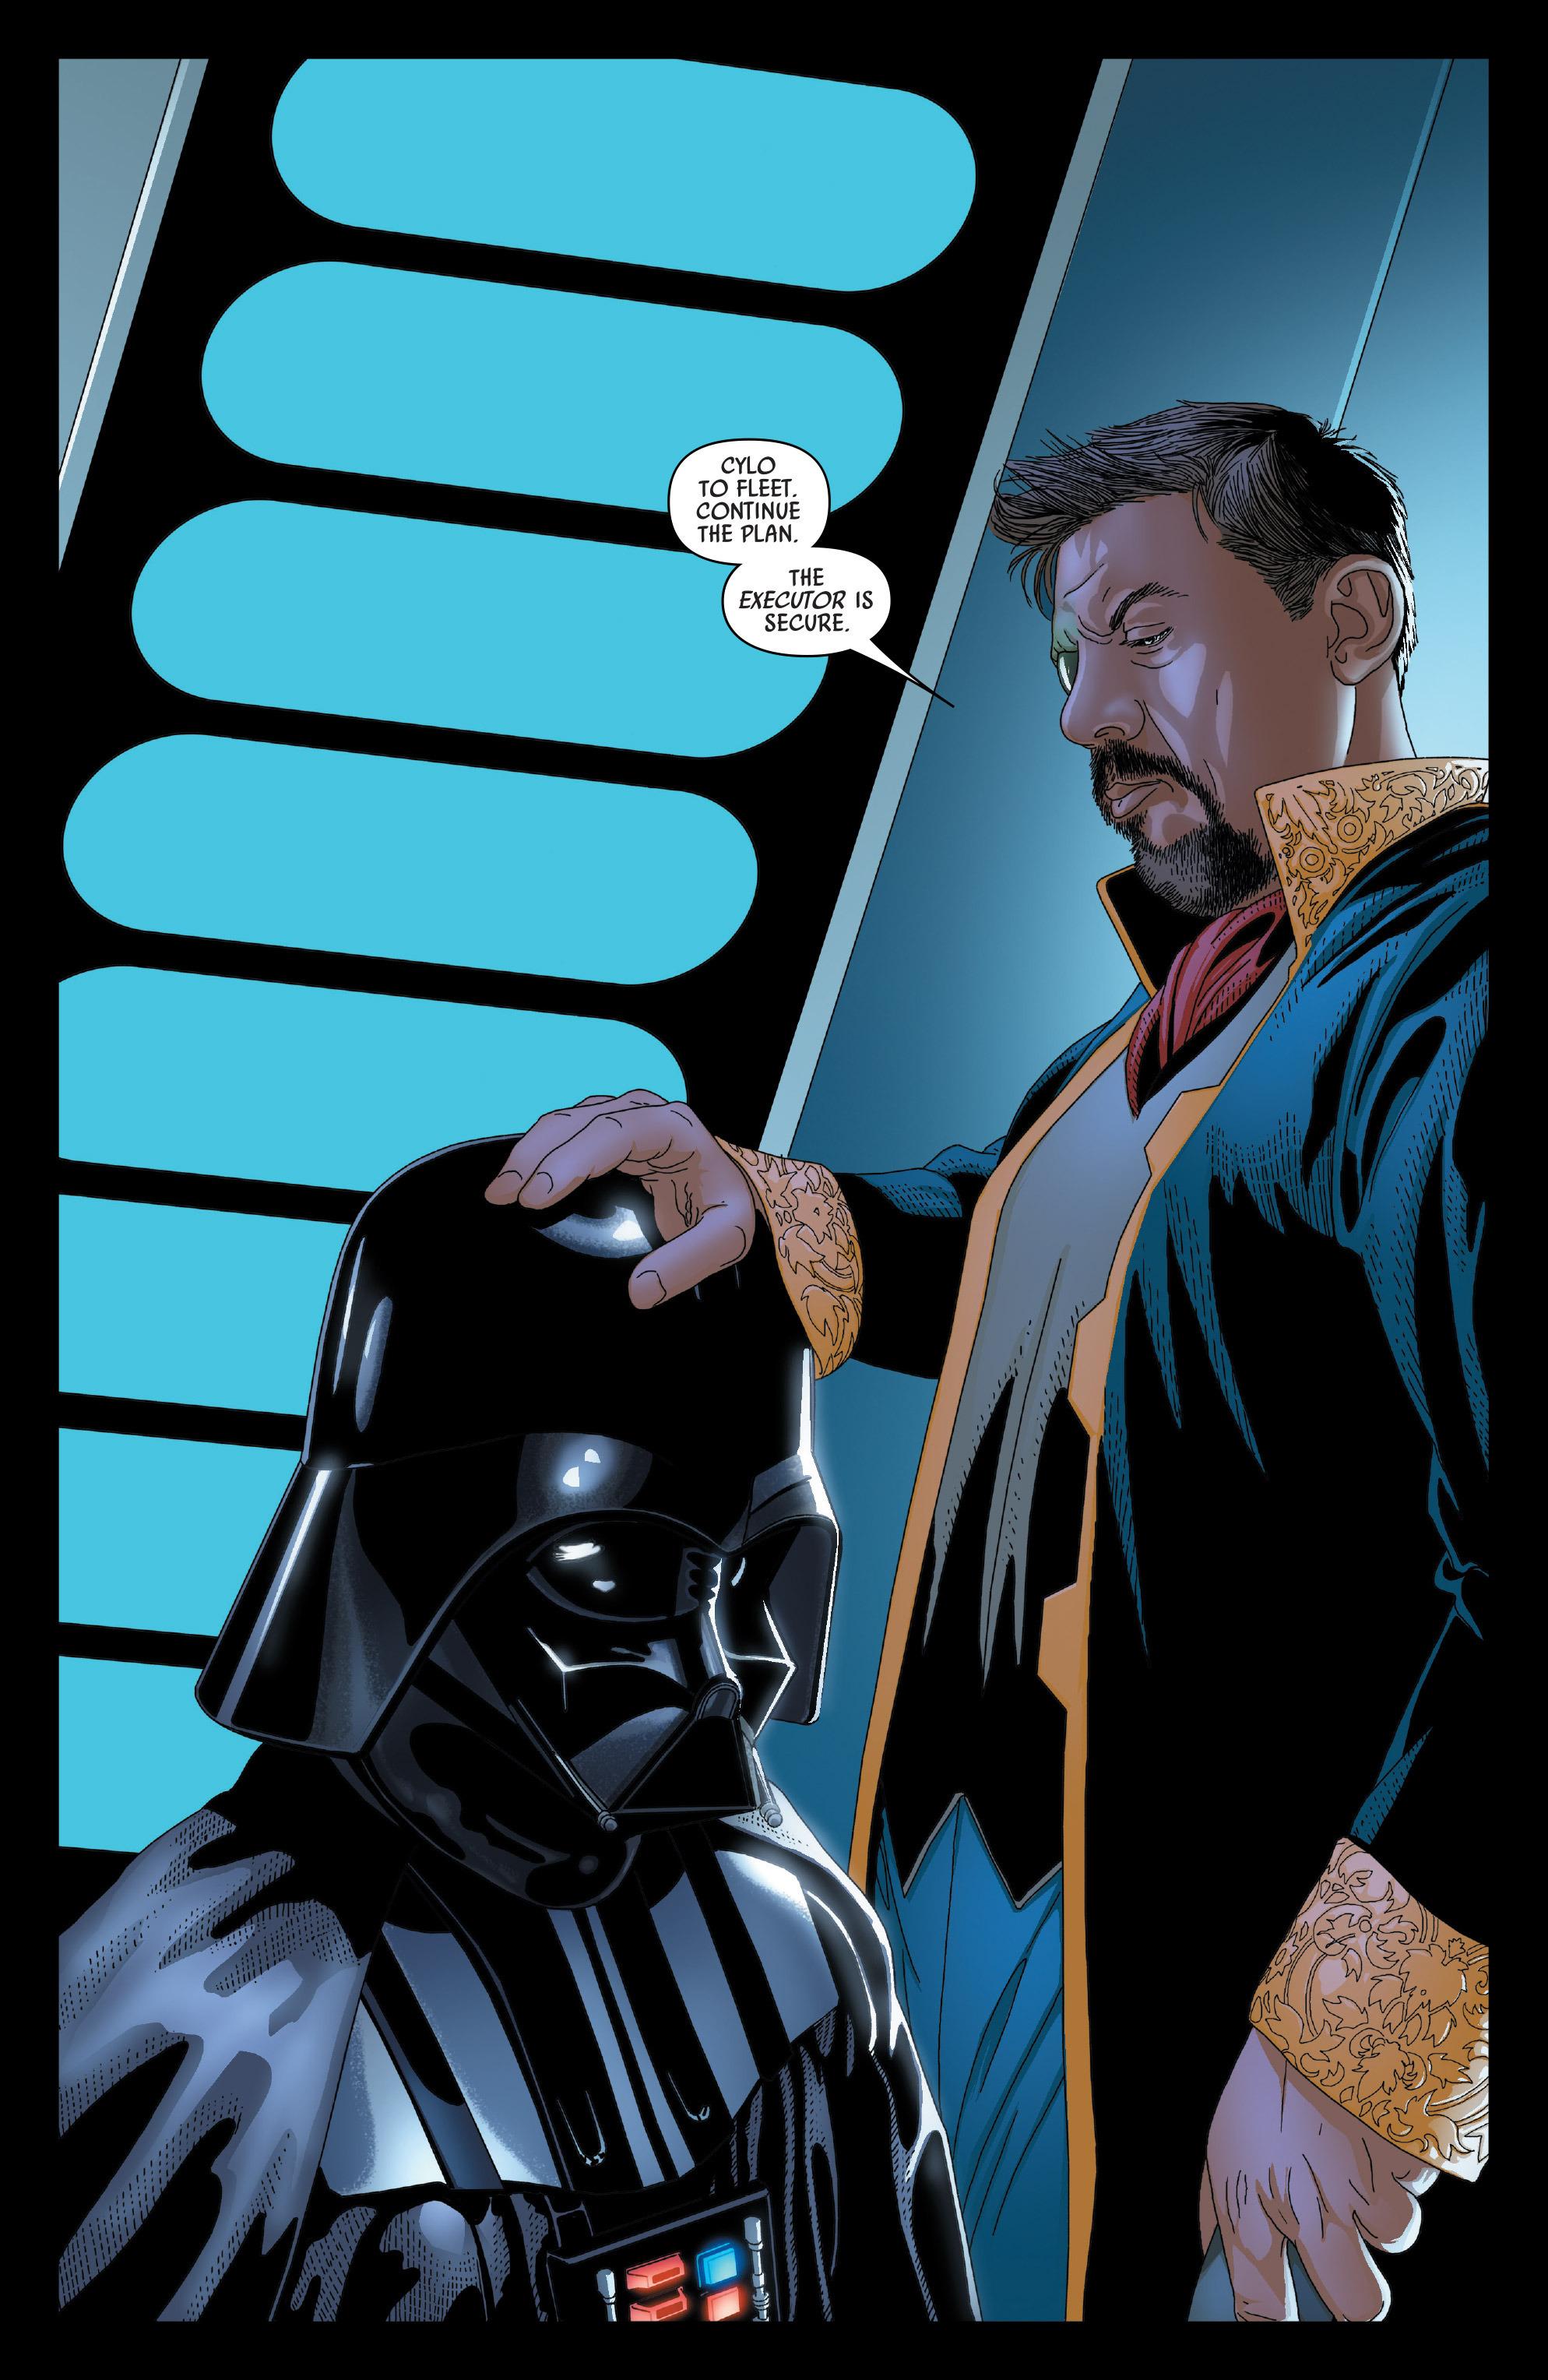 Read online Darth Vader comic -  Issue #24 - 3